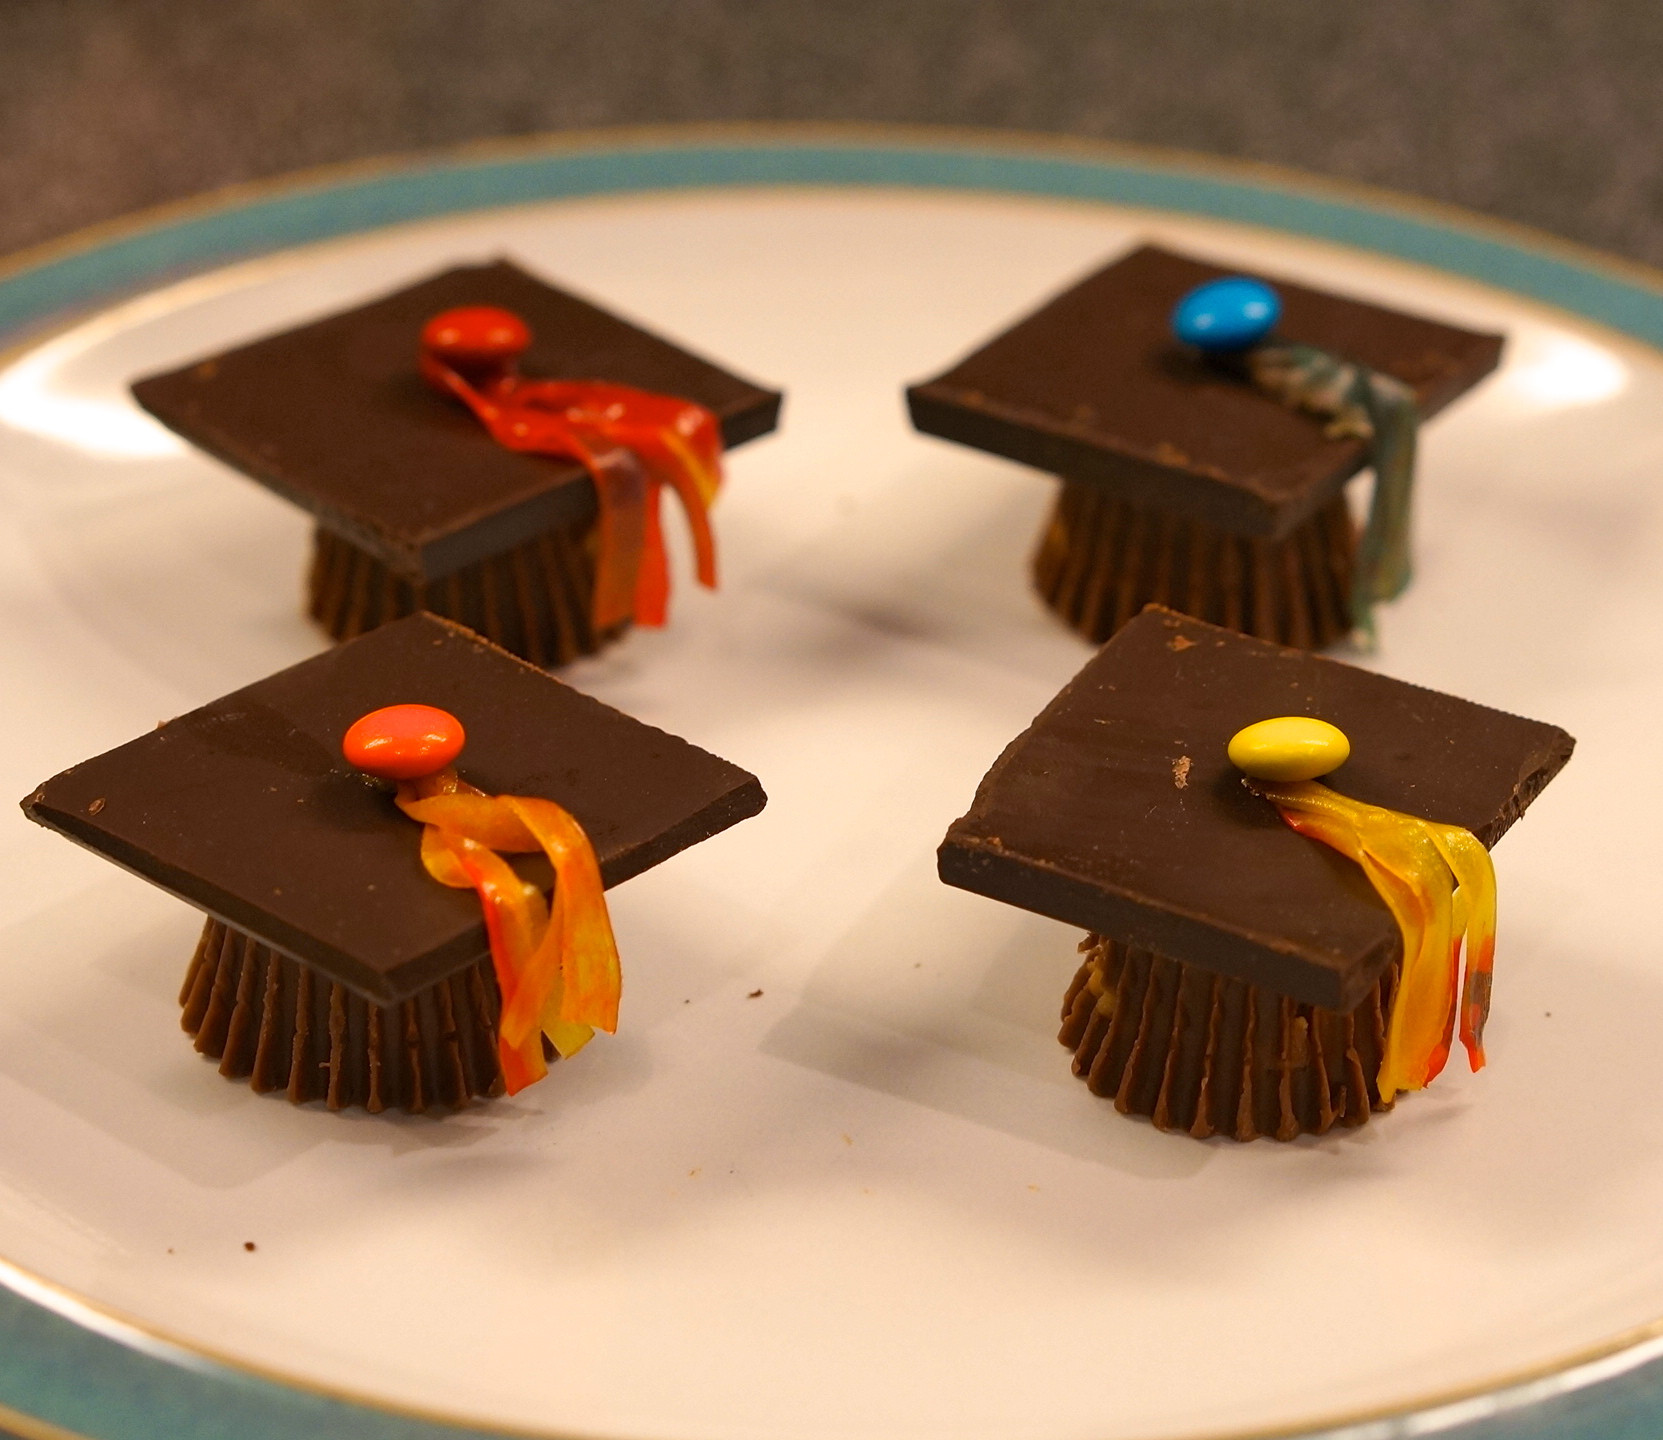 Graduation Desserts And Treats  Adorable Chocolate Graduation Cap Dessert